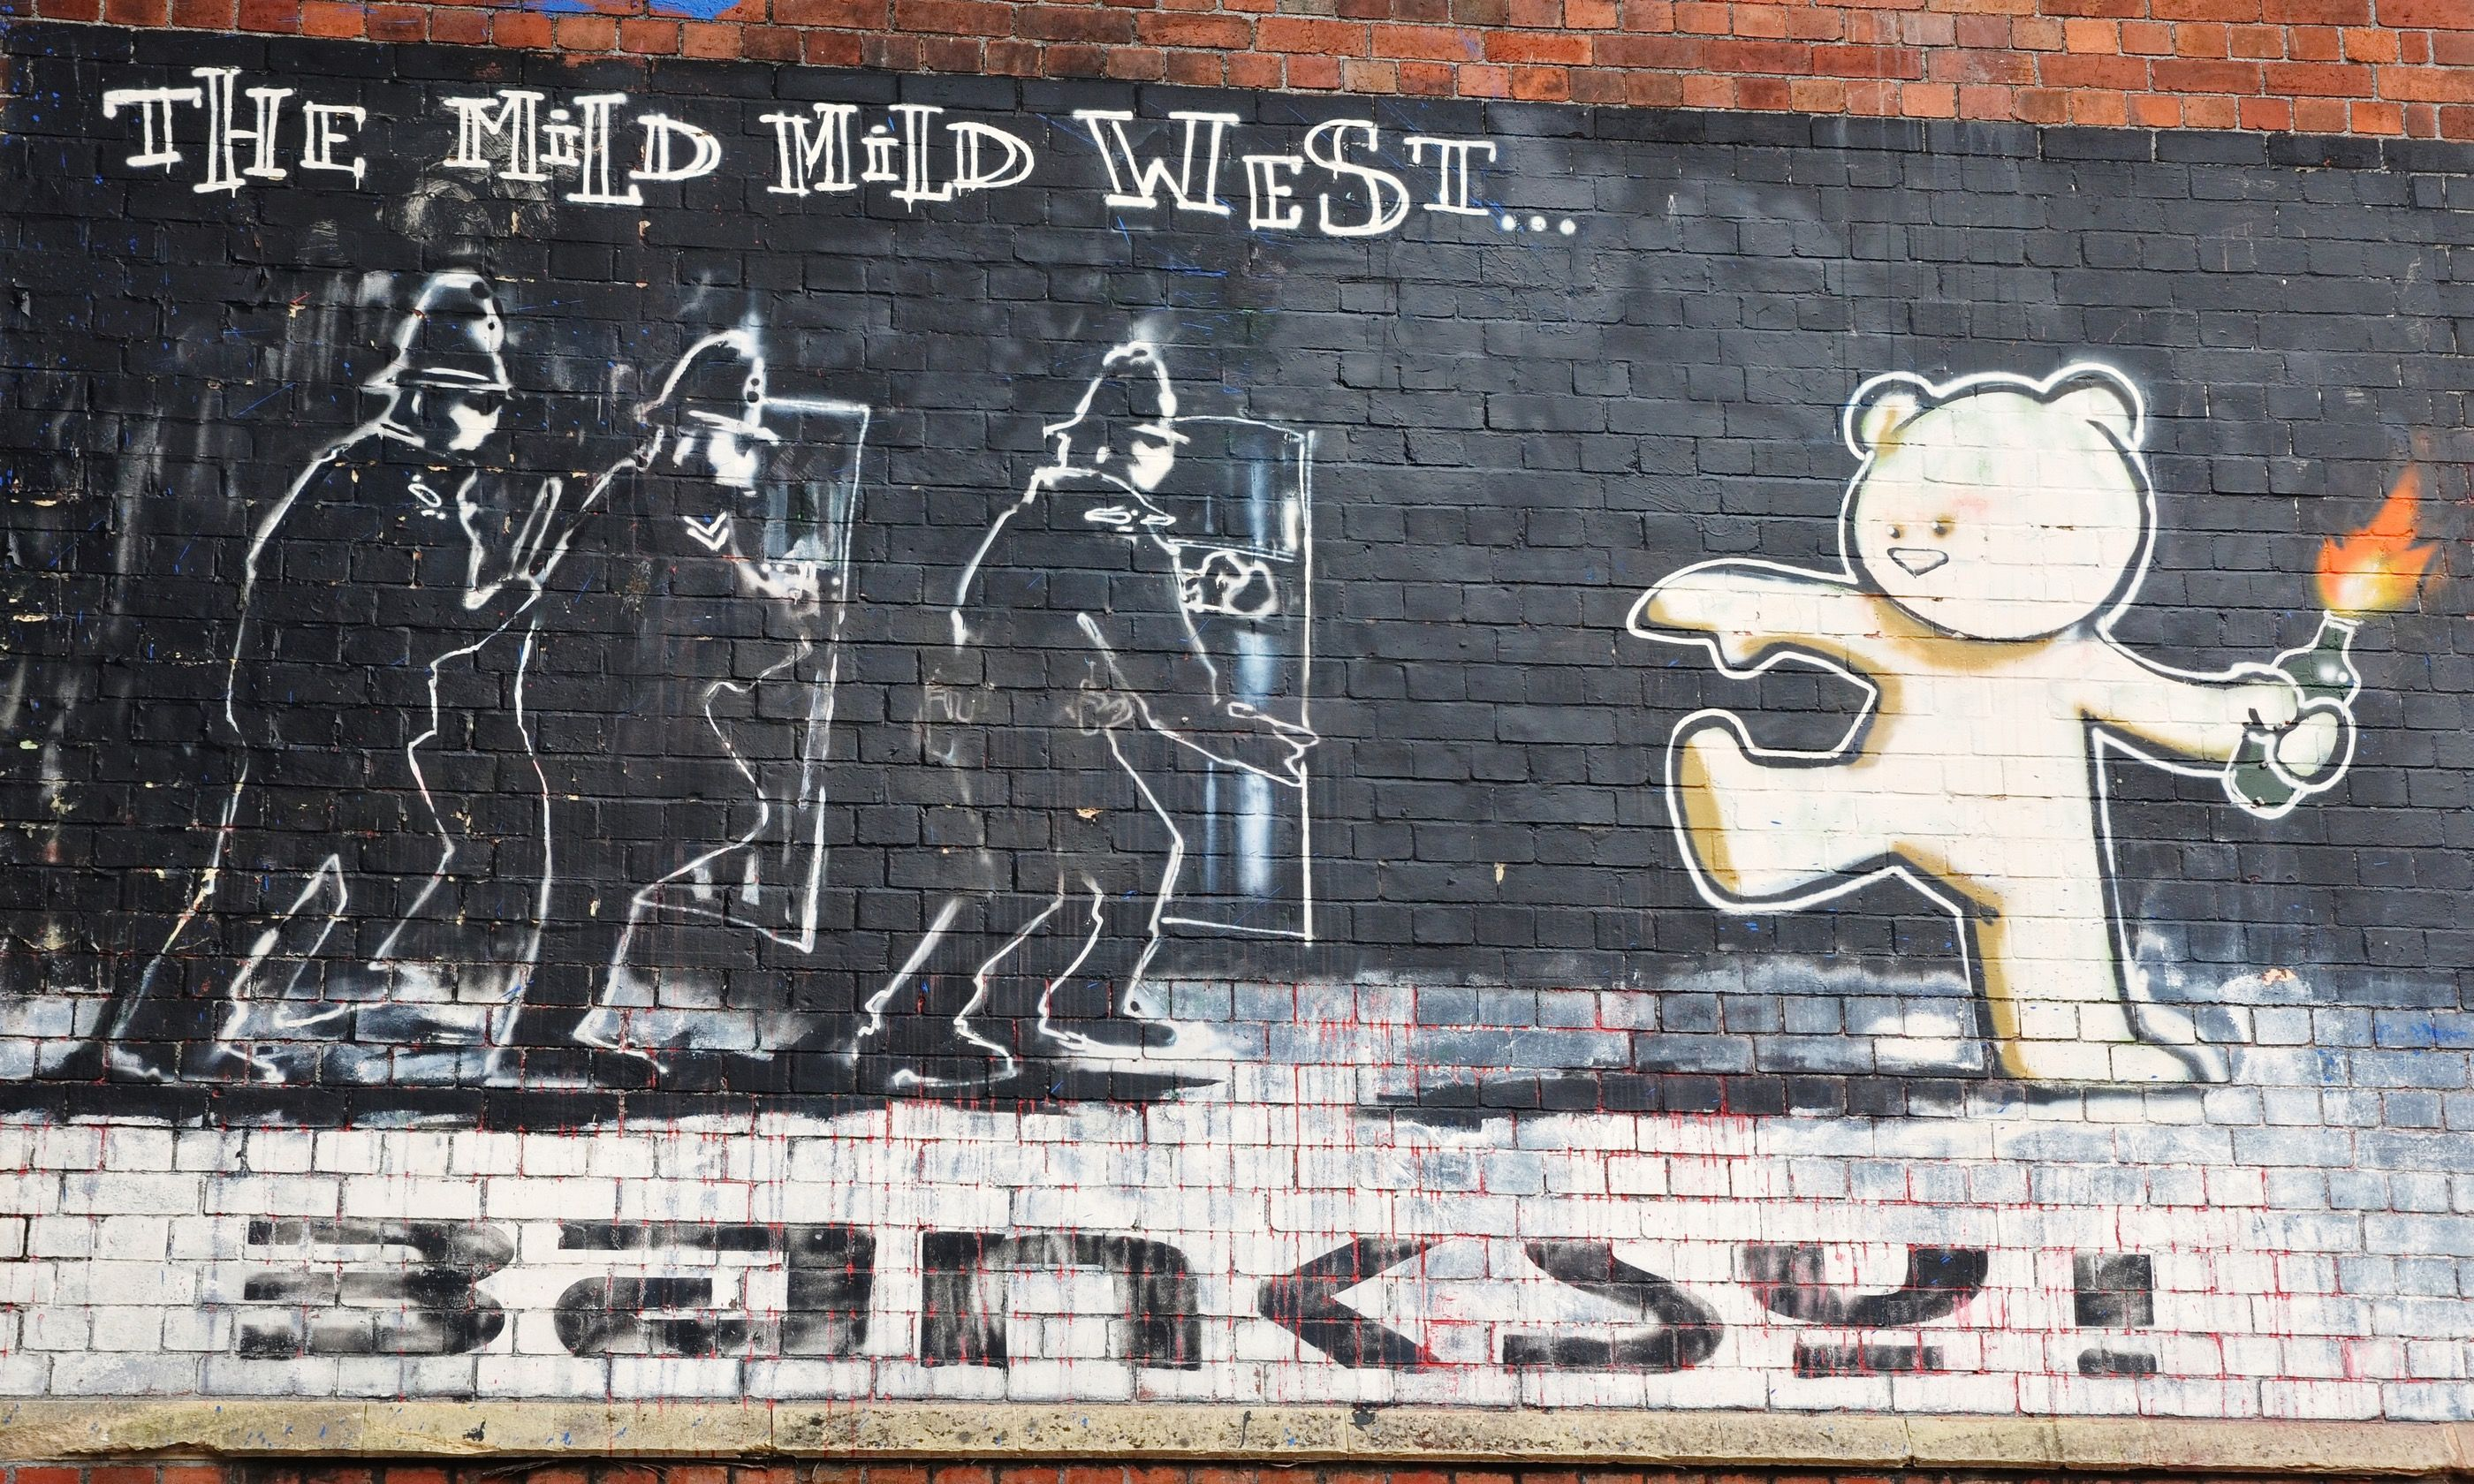 Mild, Mild West mural (Shutterctock.com)